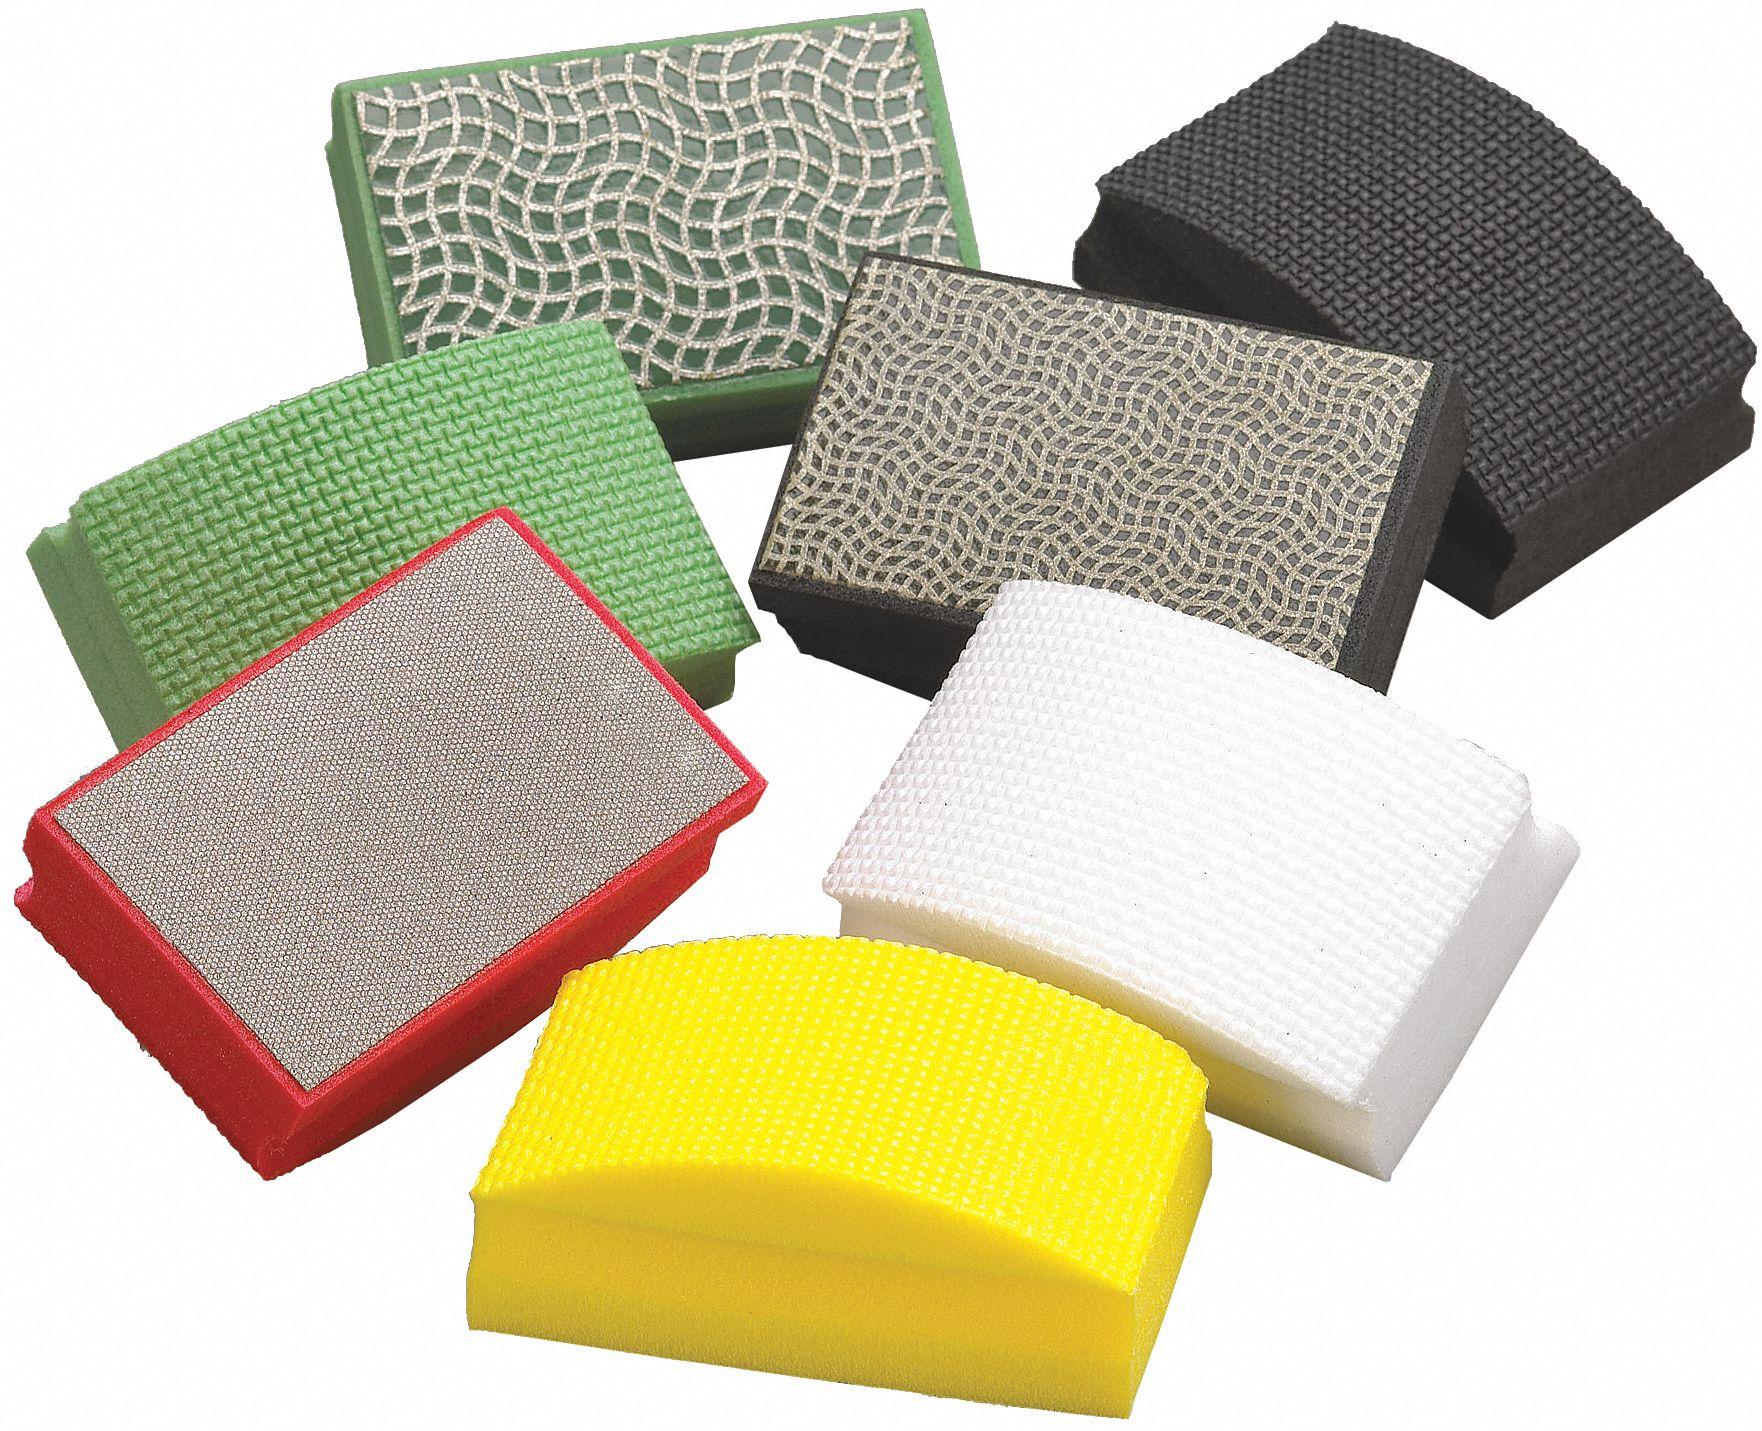 Sanding Hand Pad And Sponge Sets